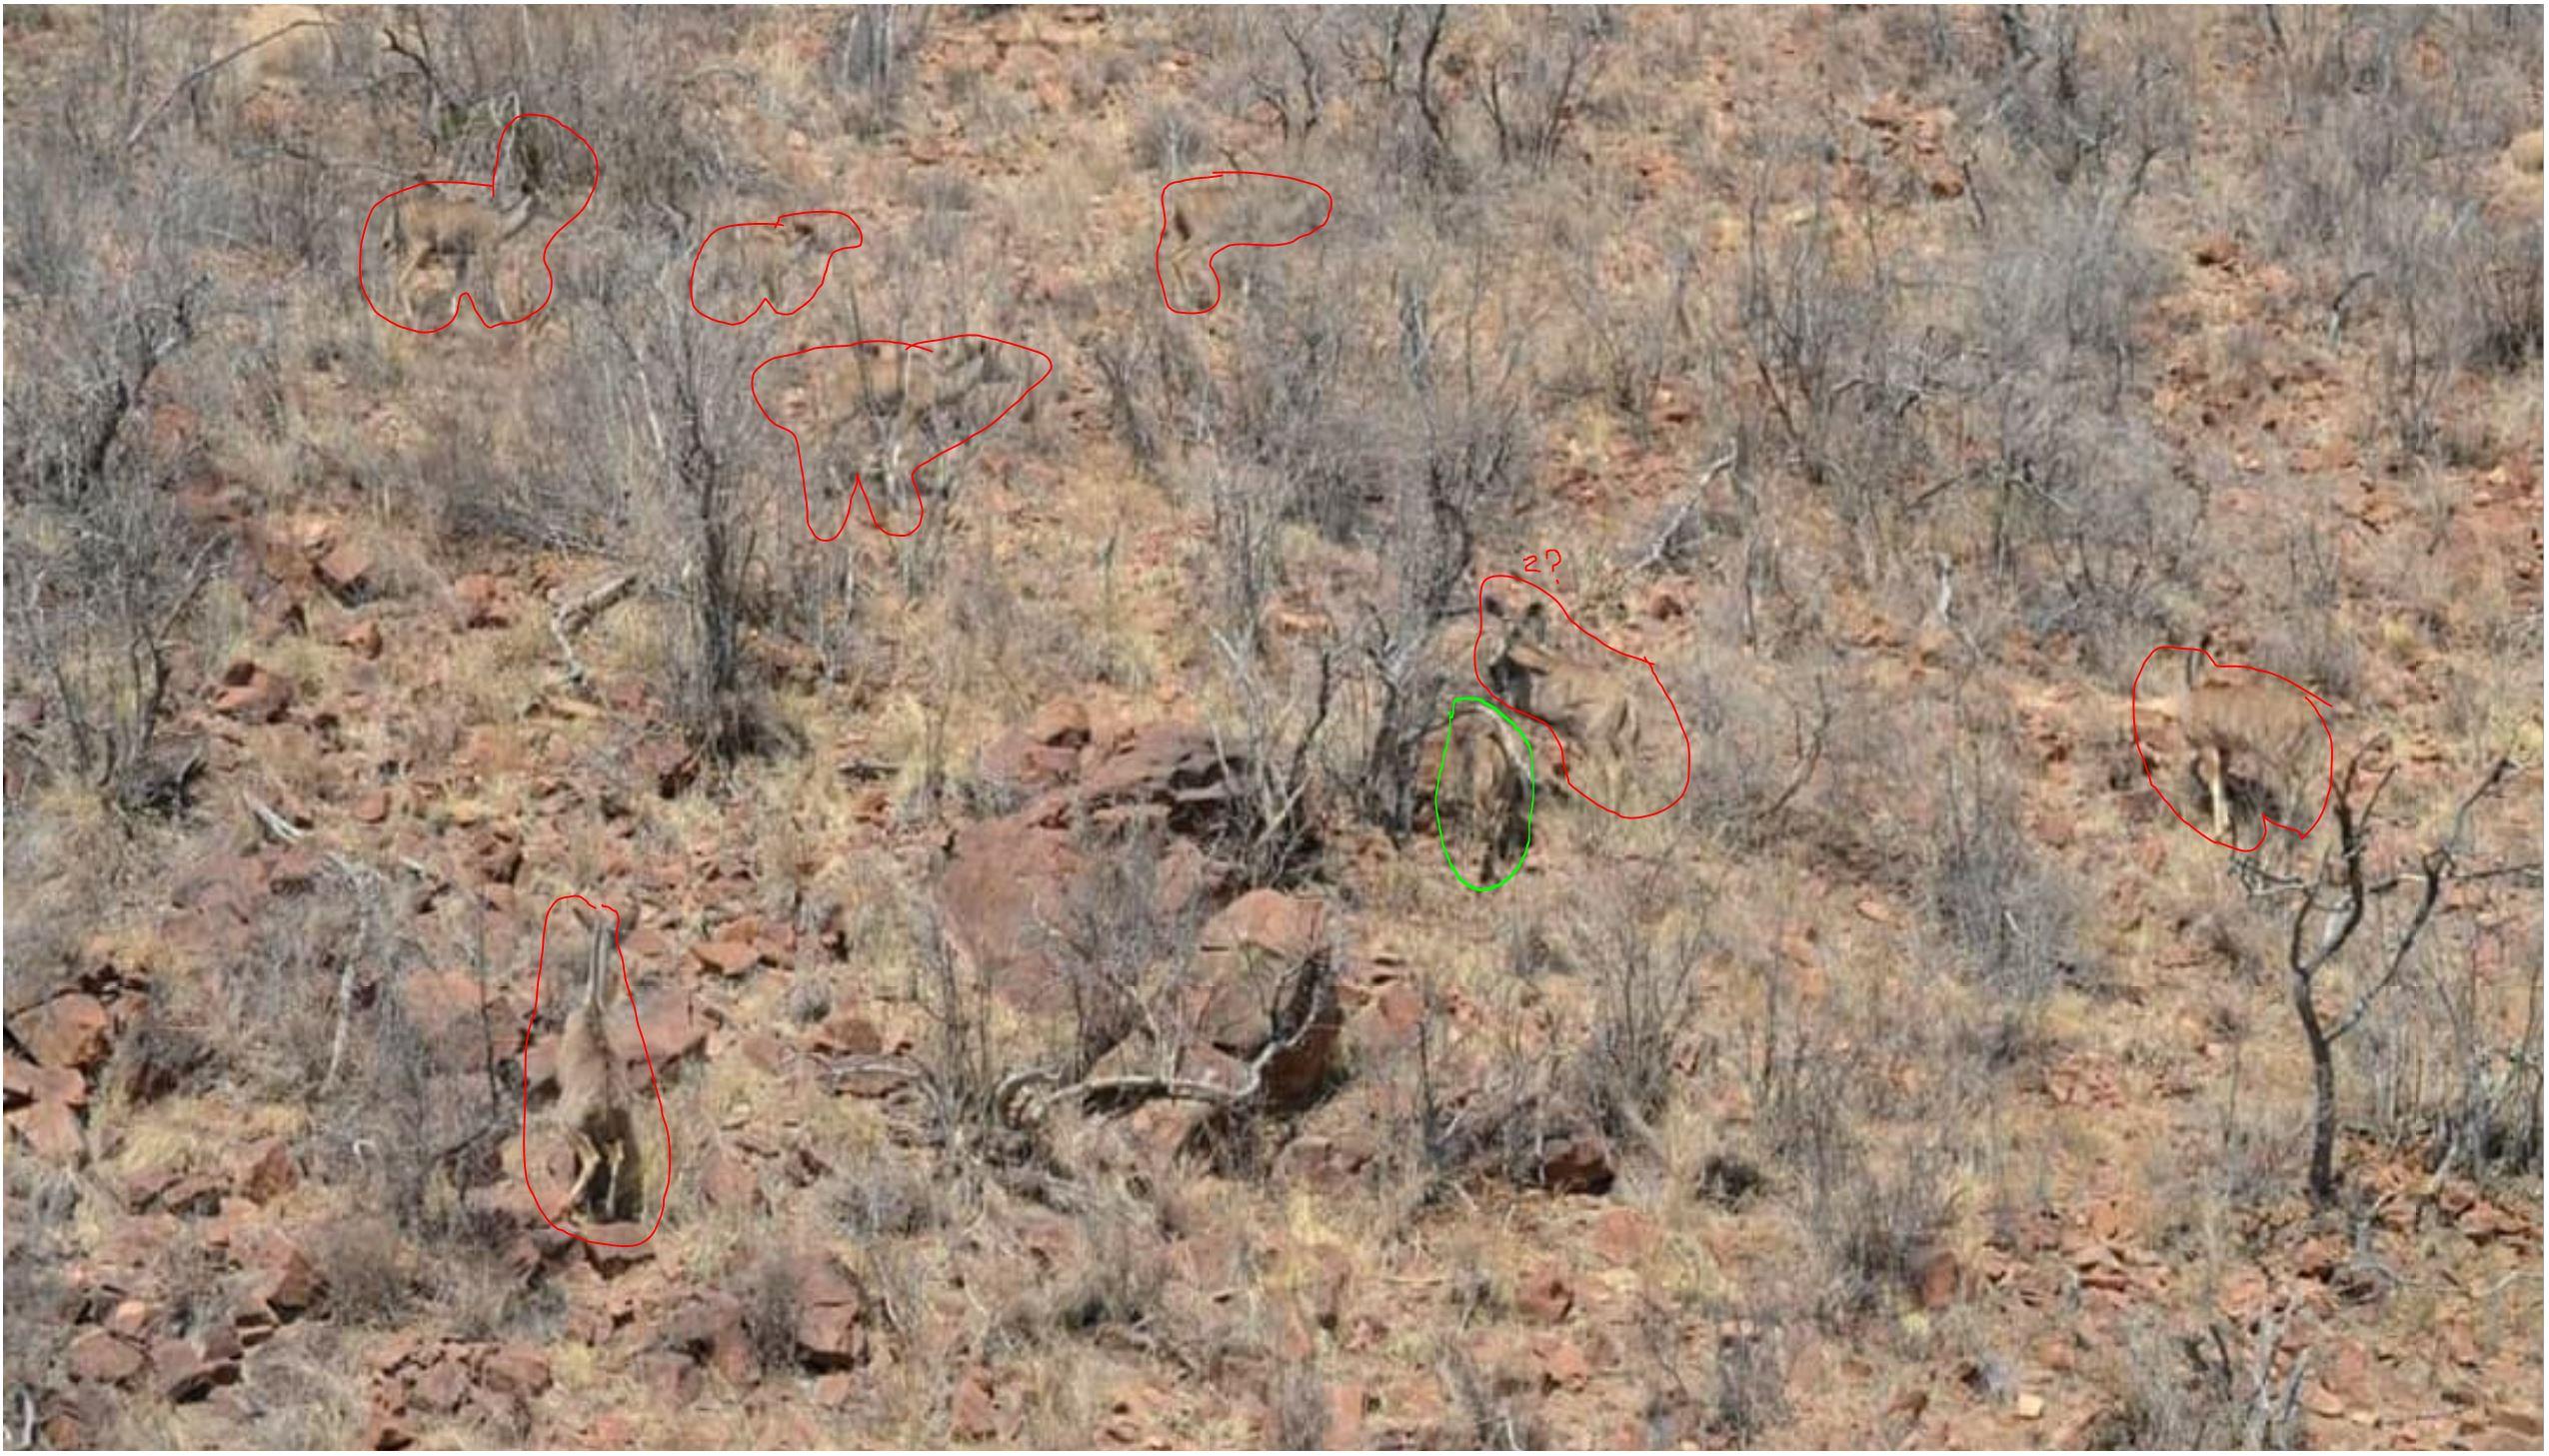 How_many_Kudu_in_photo_marked.jpg